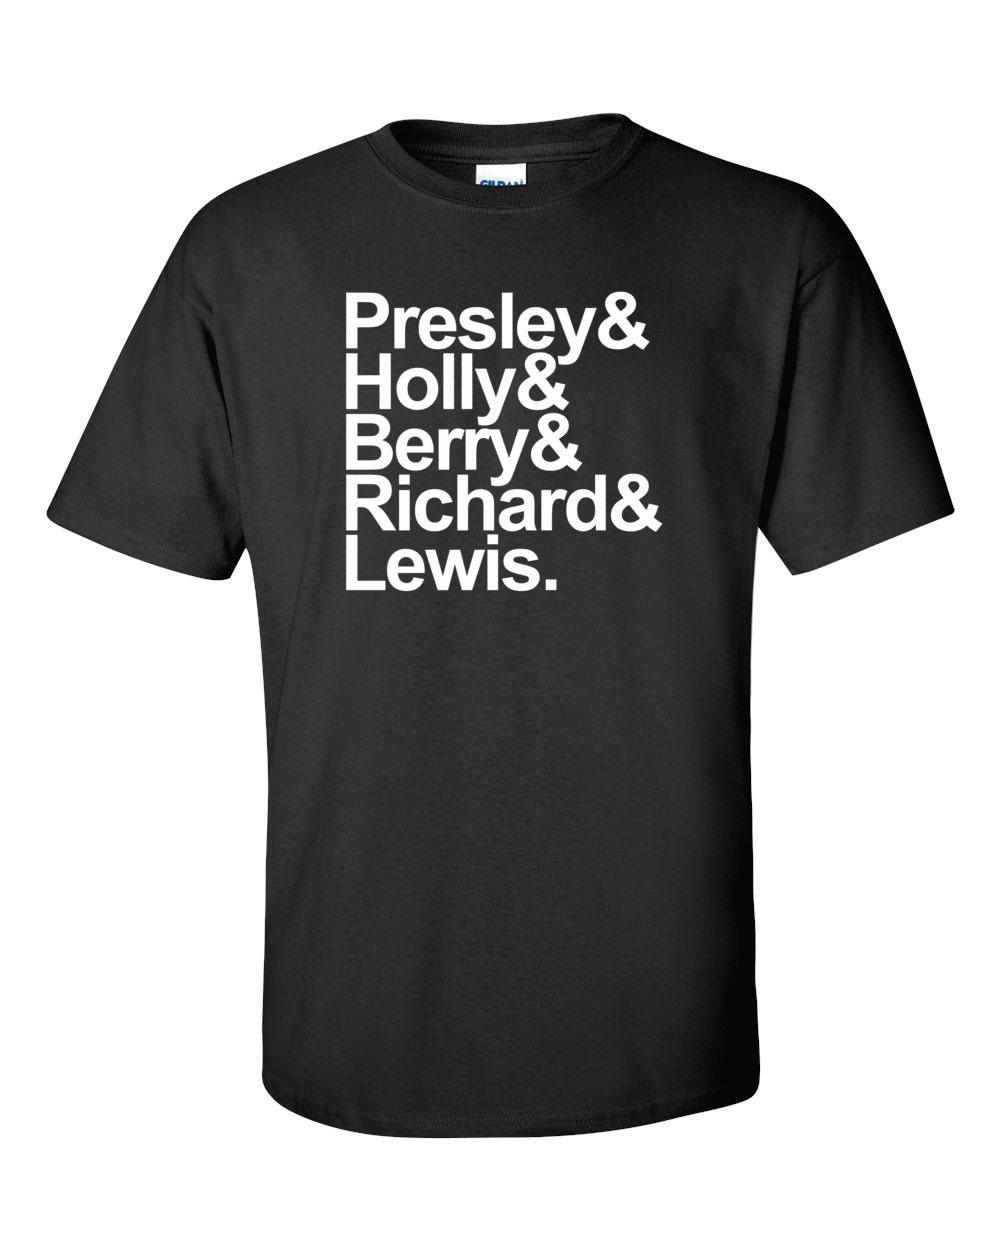 The Originals - Rock and Roll T-shirt